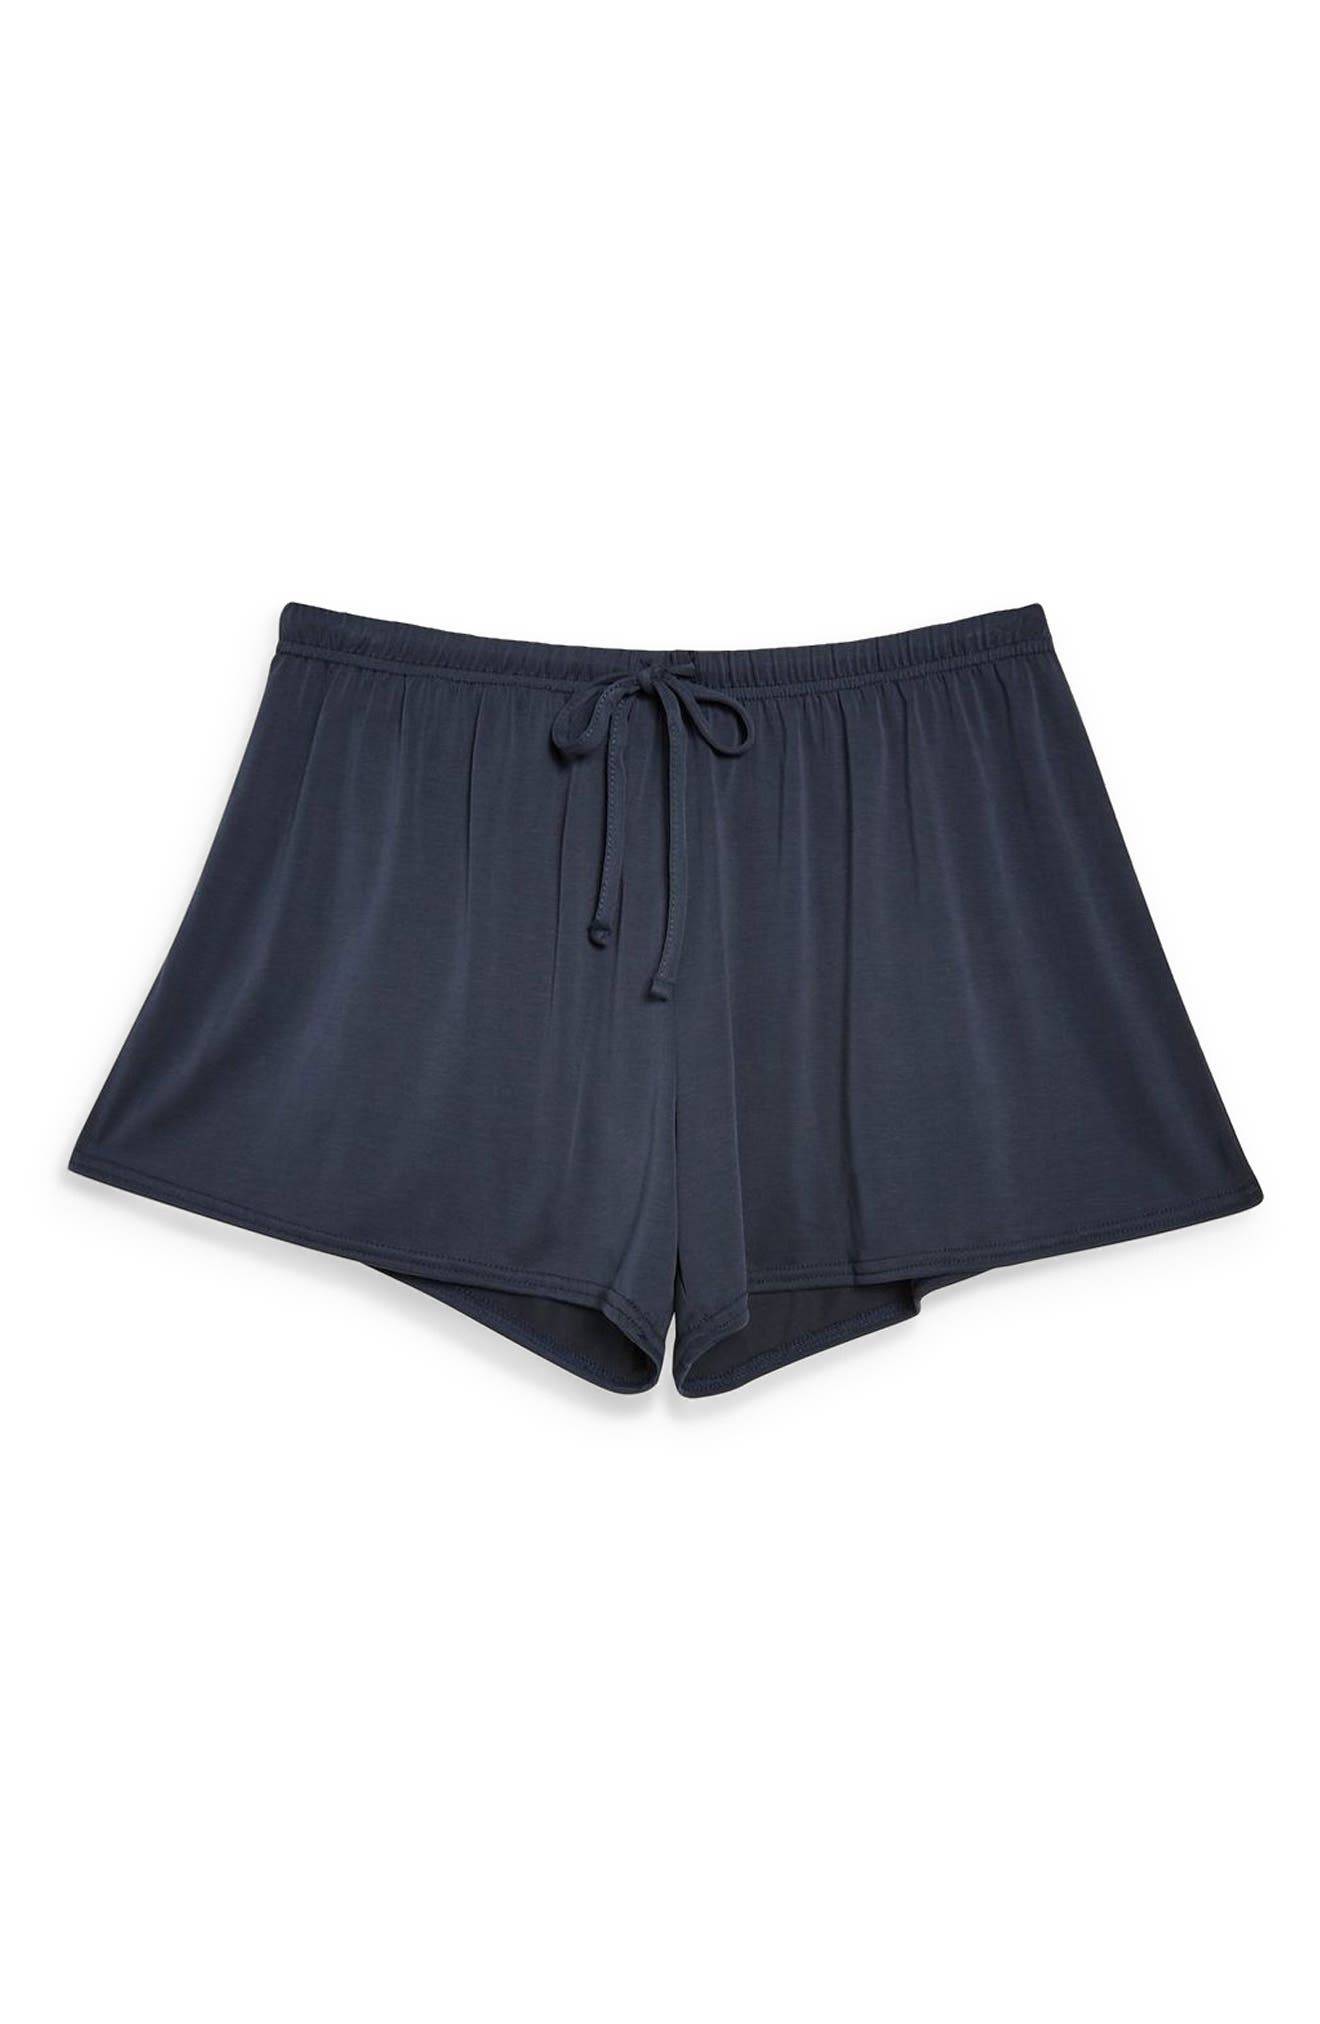 Lounge Shorts,                             Alternate thumbnail 3, color,                             NAVY BLUE